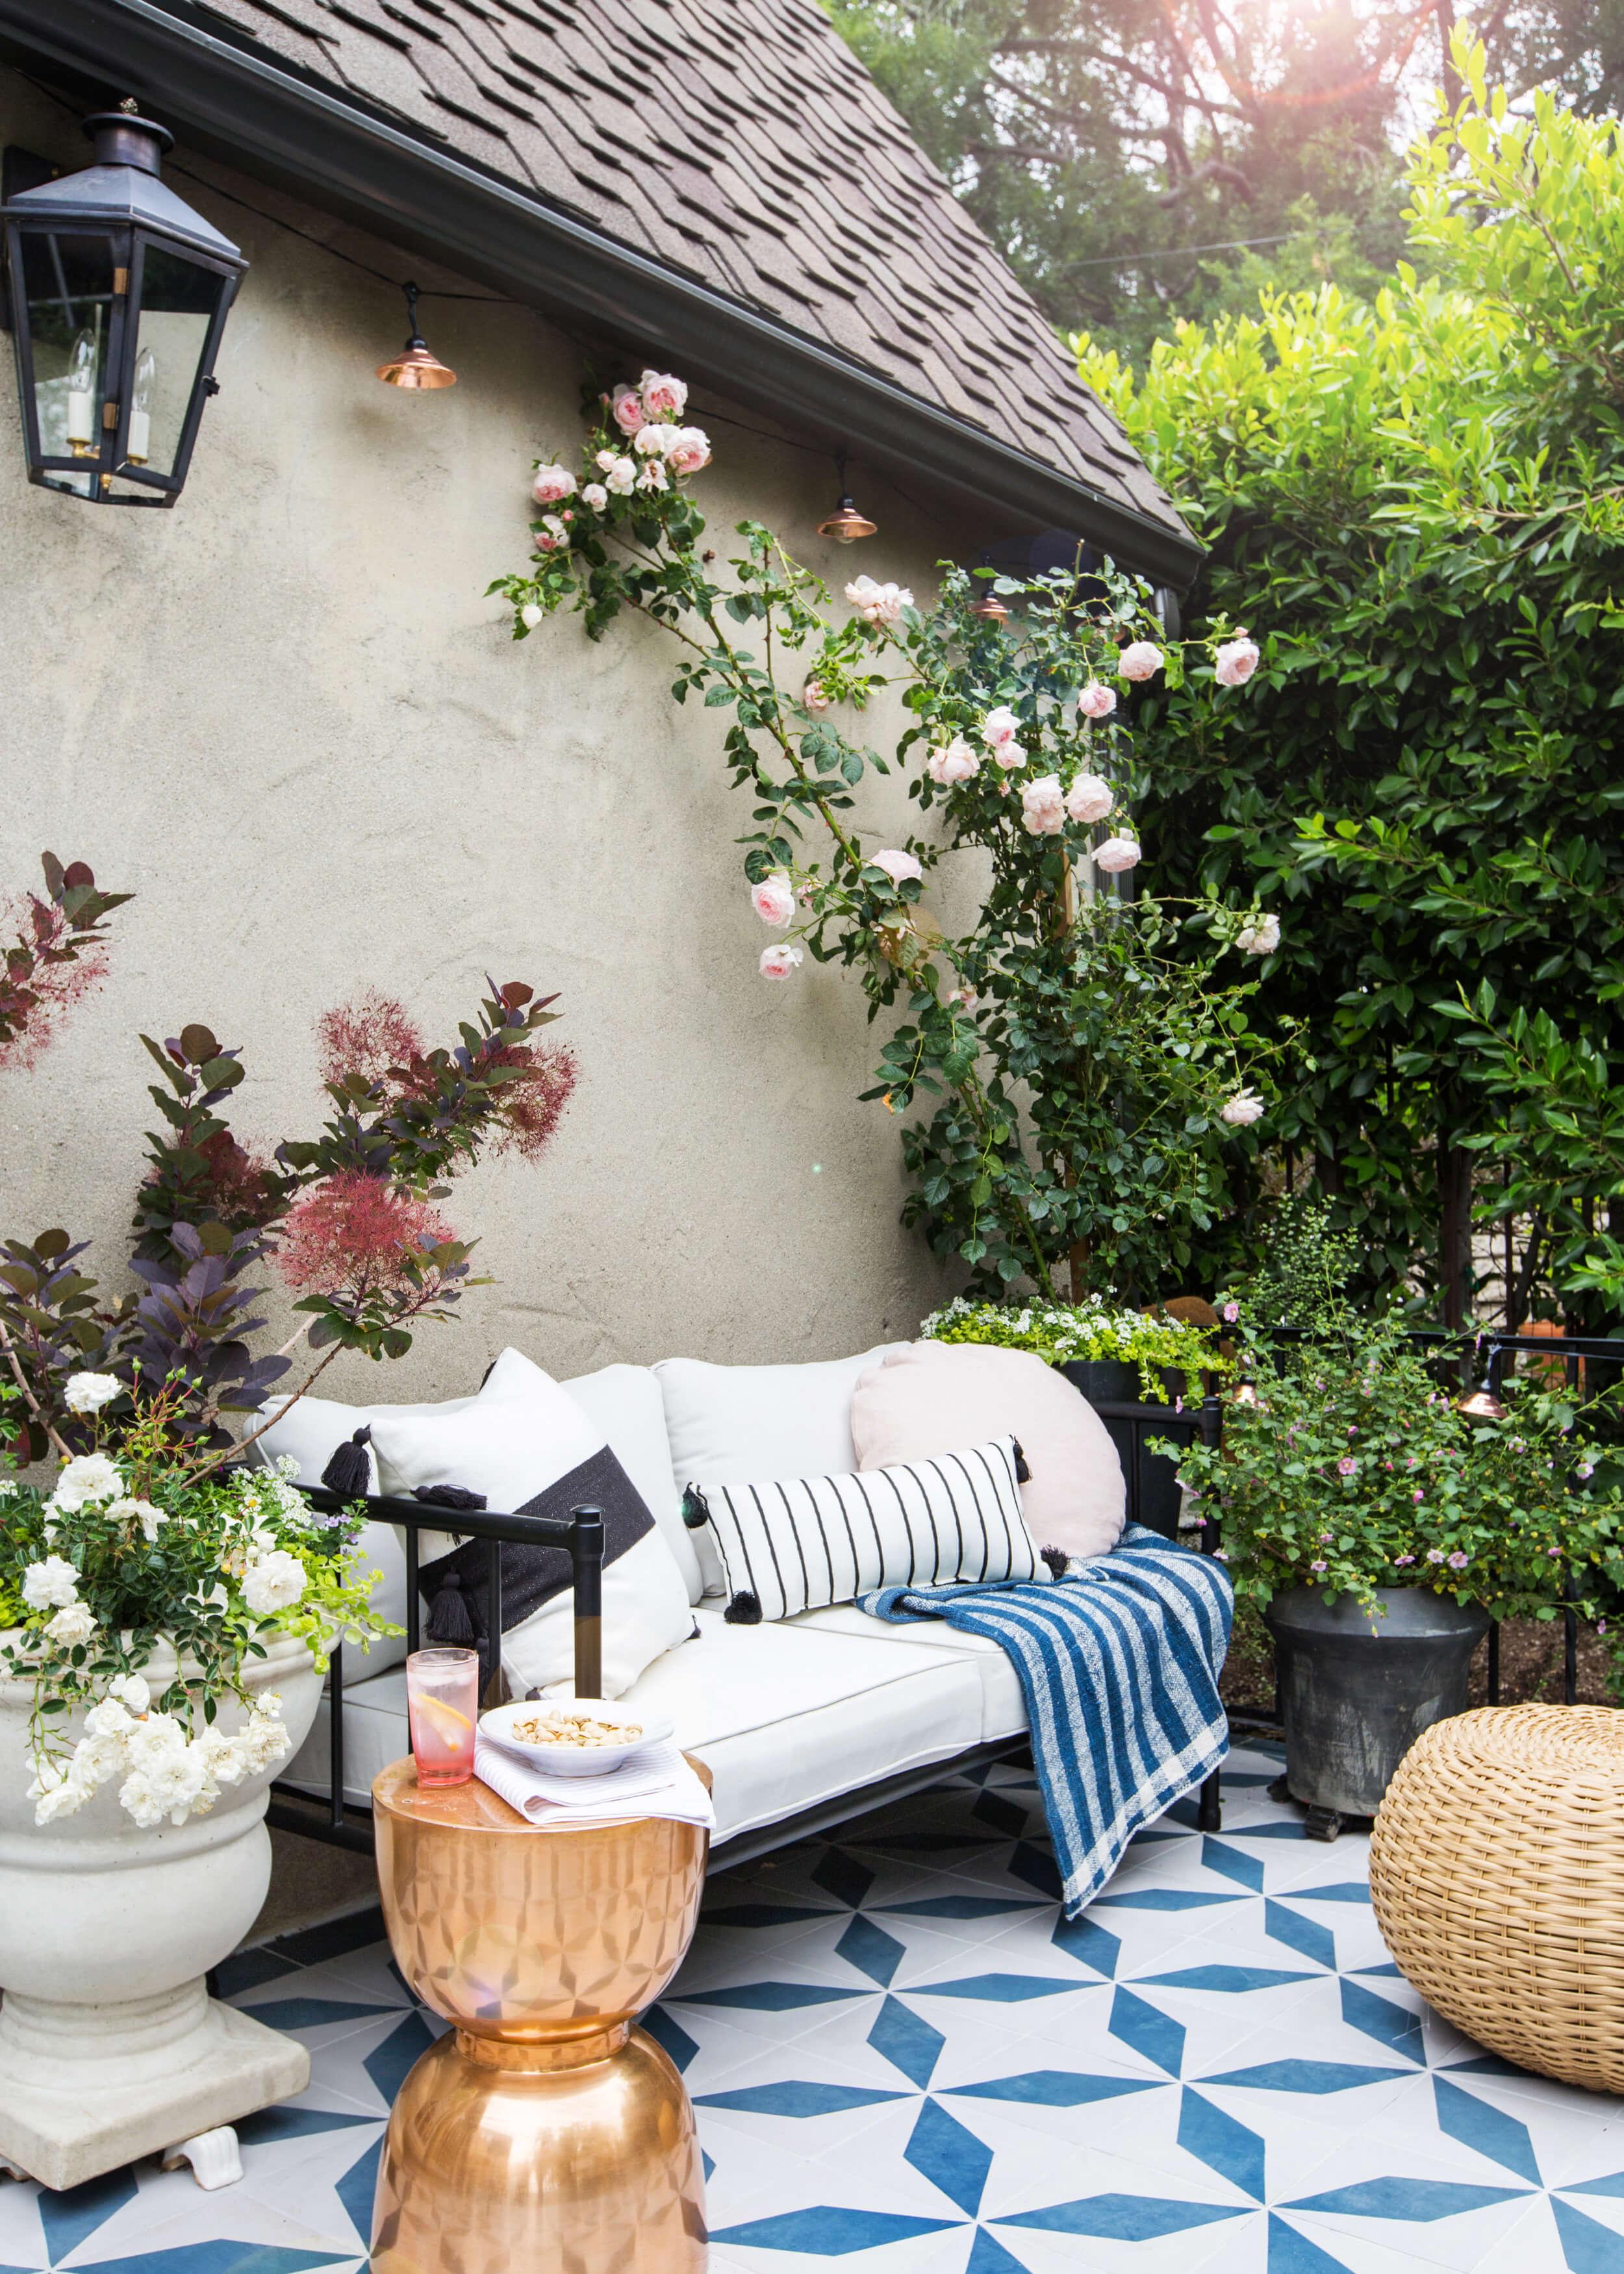 5 Inspiring outdoor spaces